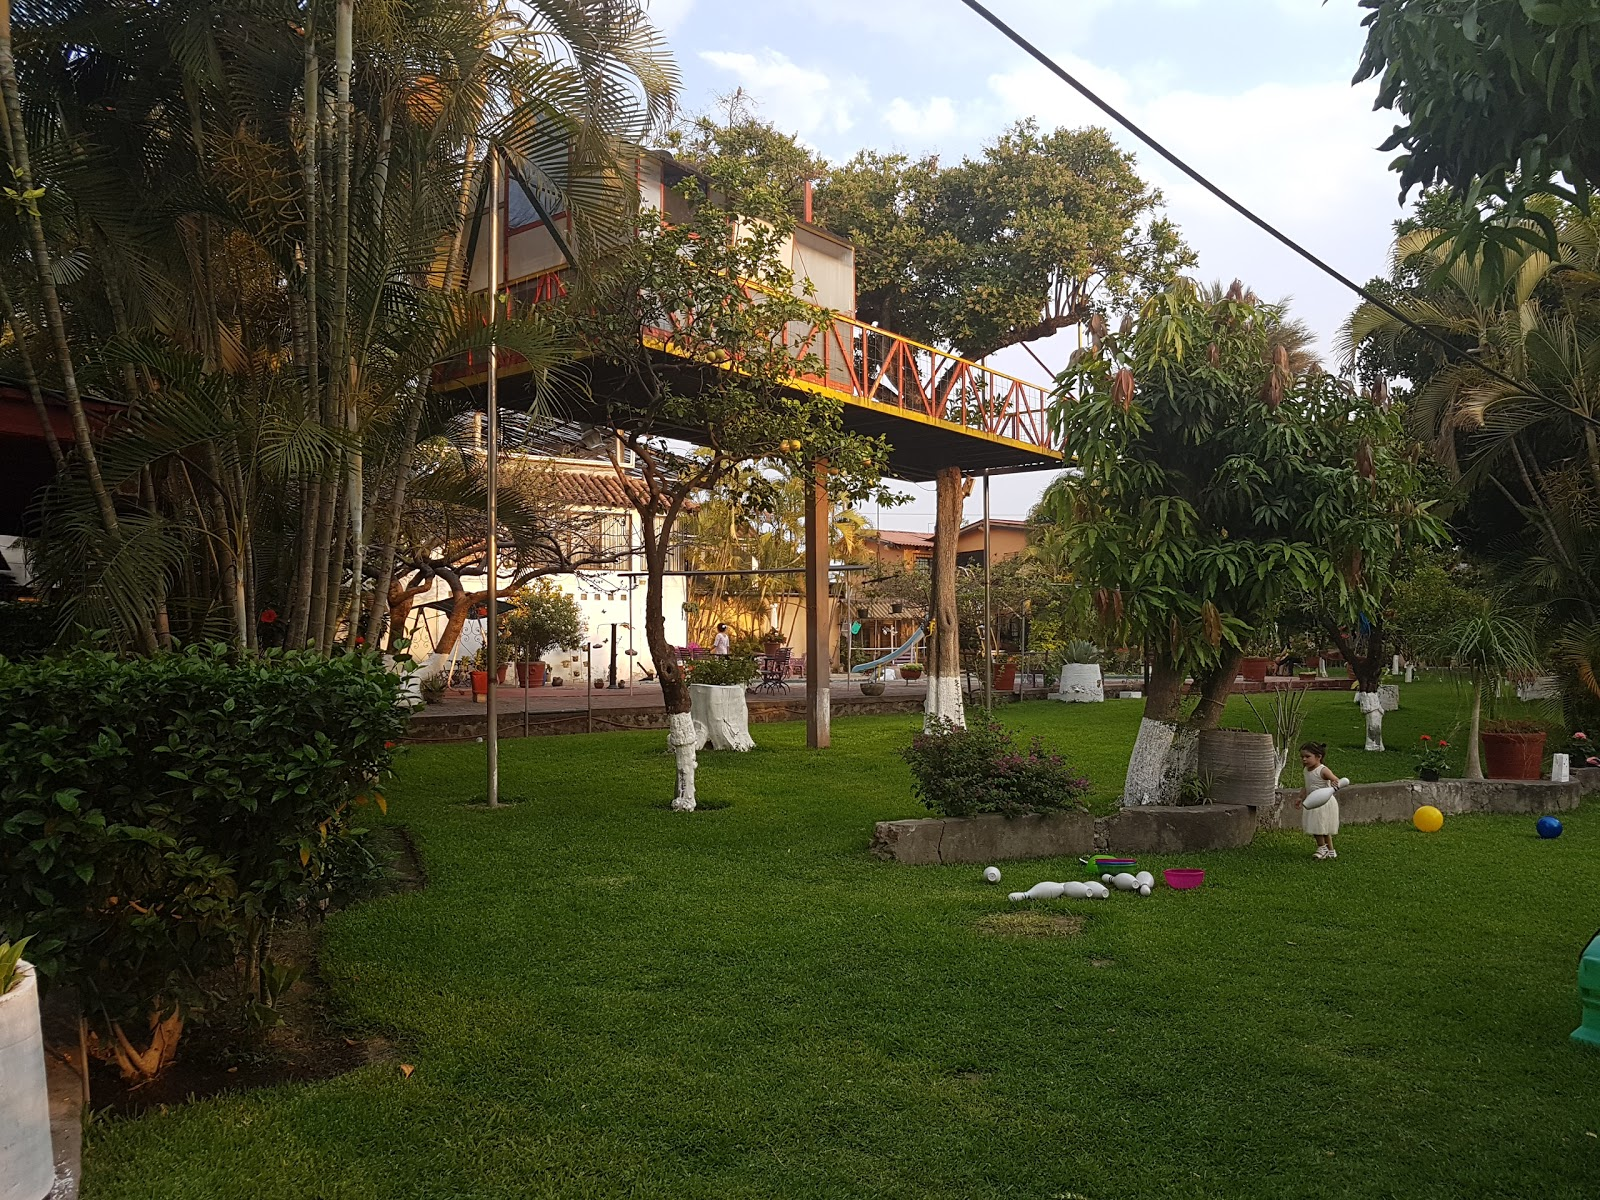 Hotel yautepec around guides for Villas jazmin 2 yautepec